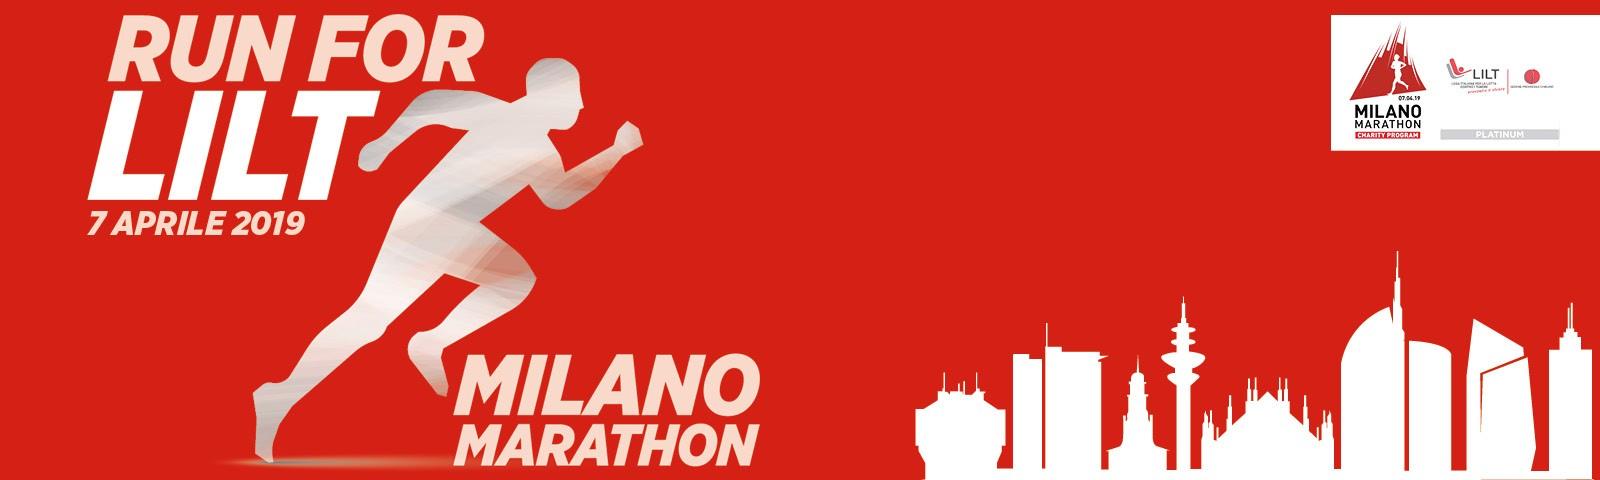 Corri con noi alla Milano Marathon